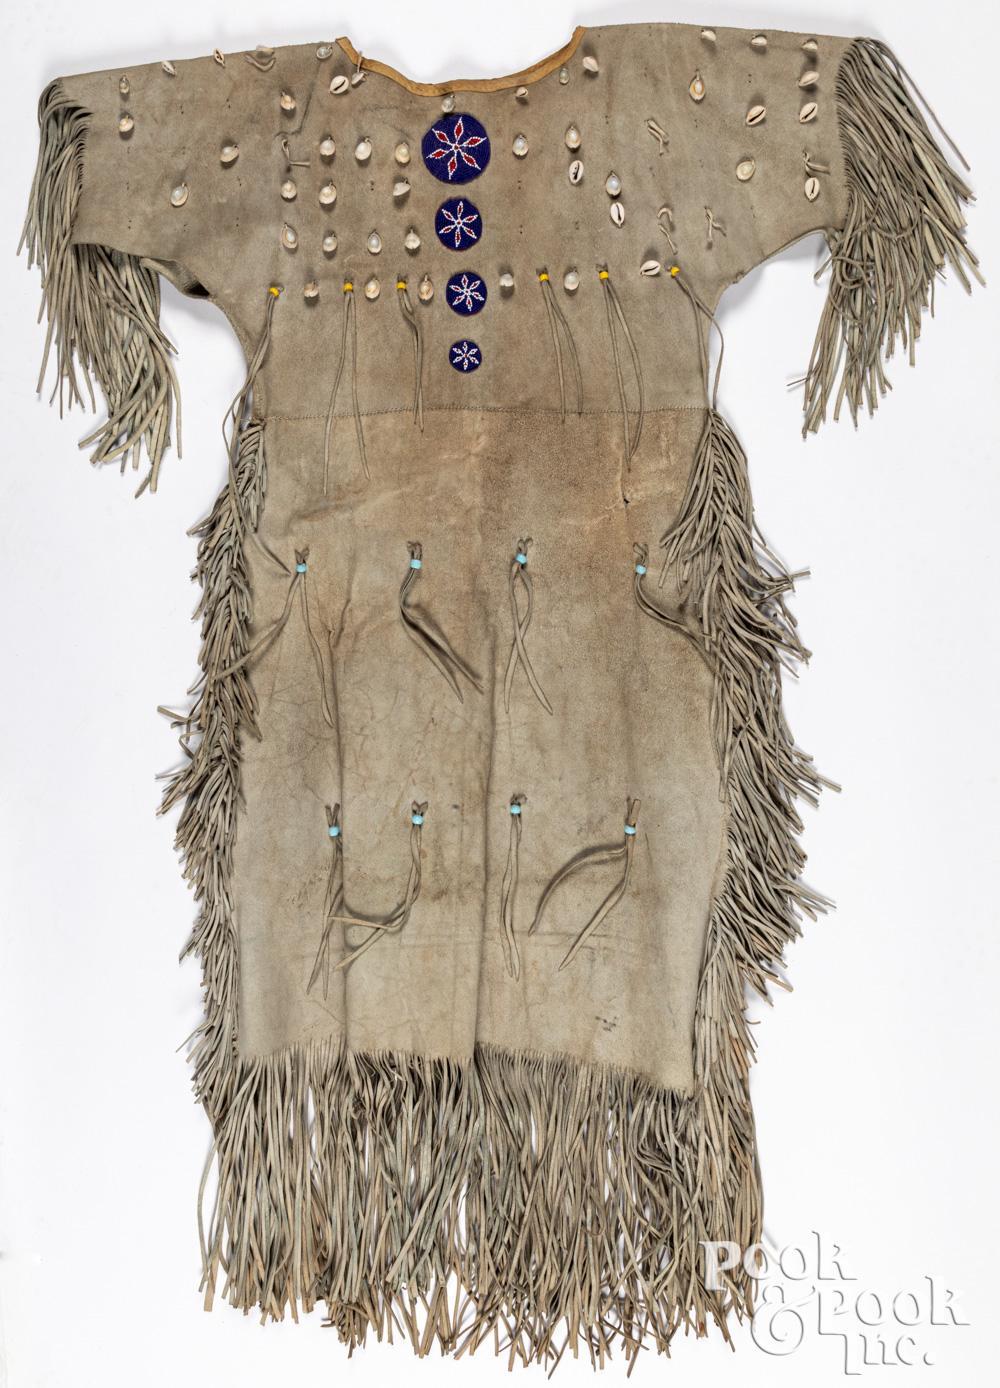 Comanche Indian woman's hide dress, mid 20th c.